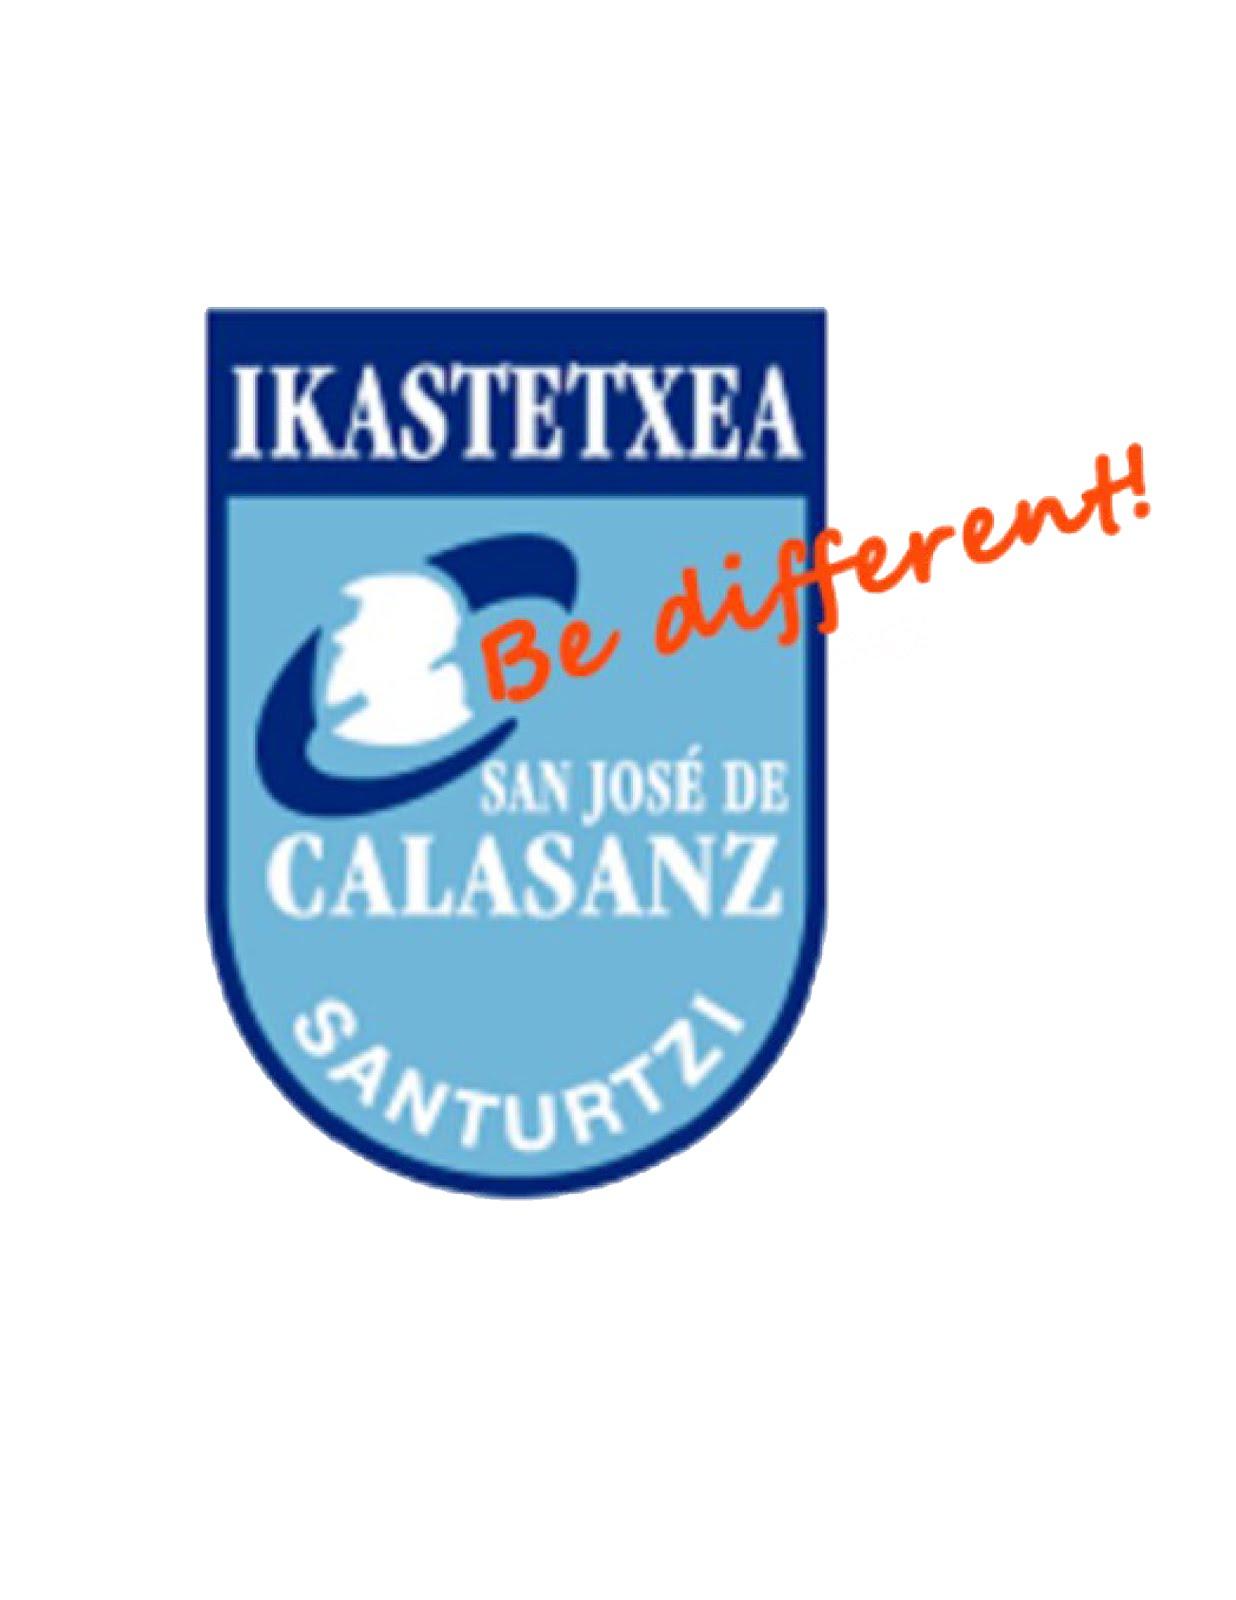 San Jose de Calasanz Ikastetxea